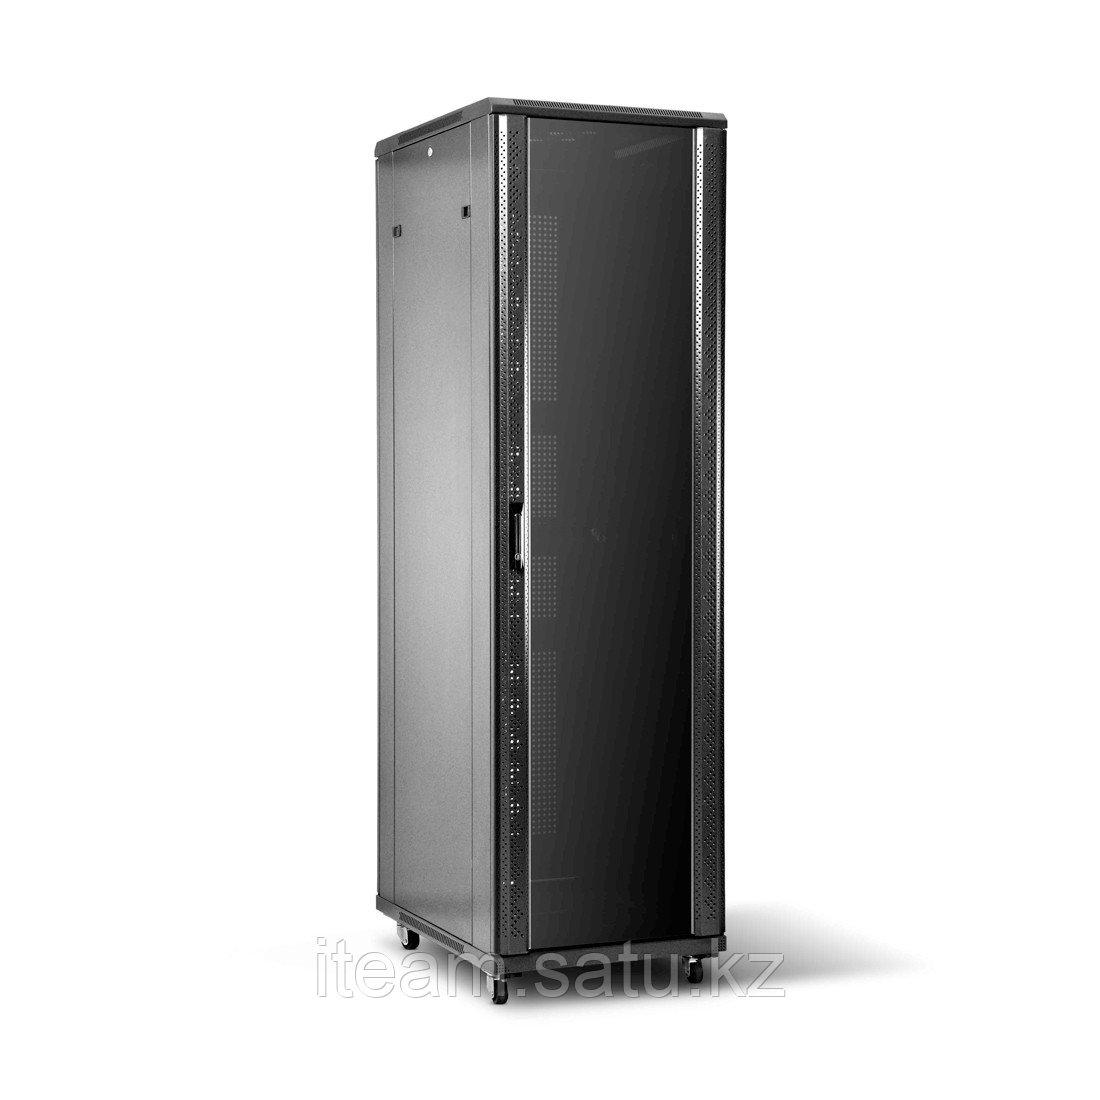 Шкаф серверный SHIP 601S.6242.24.100 42U, 600*1200*2000 мм